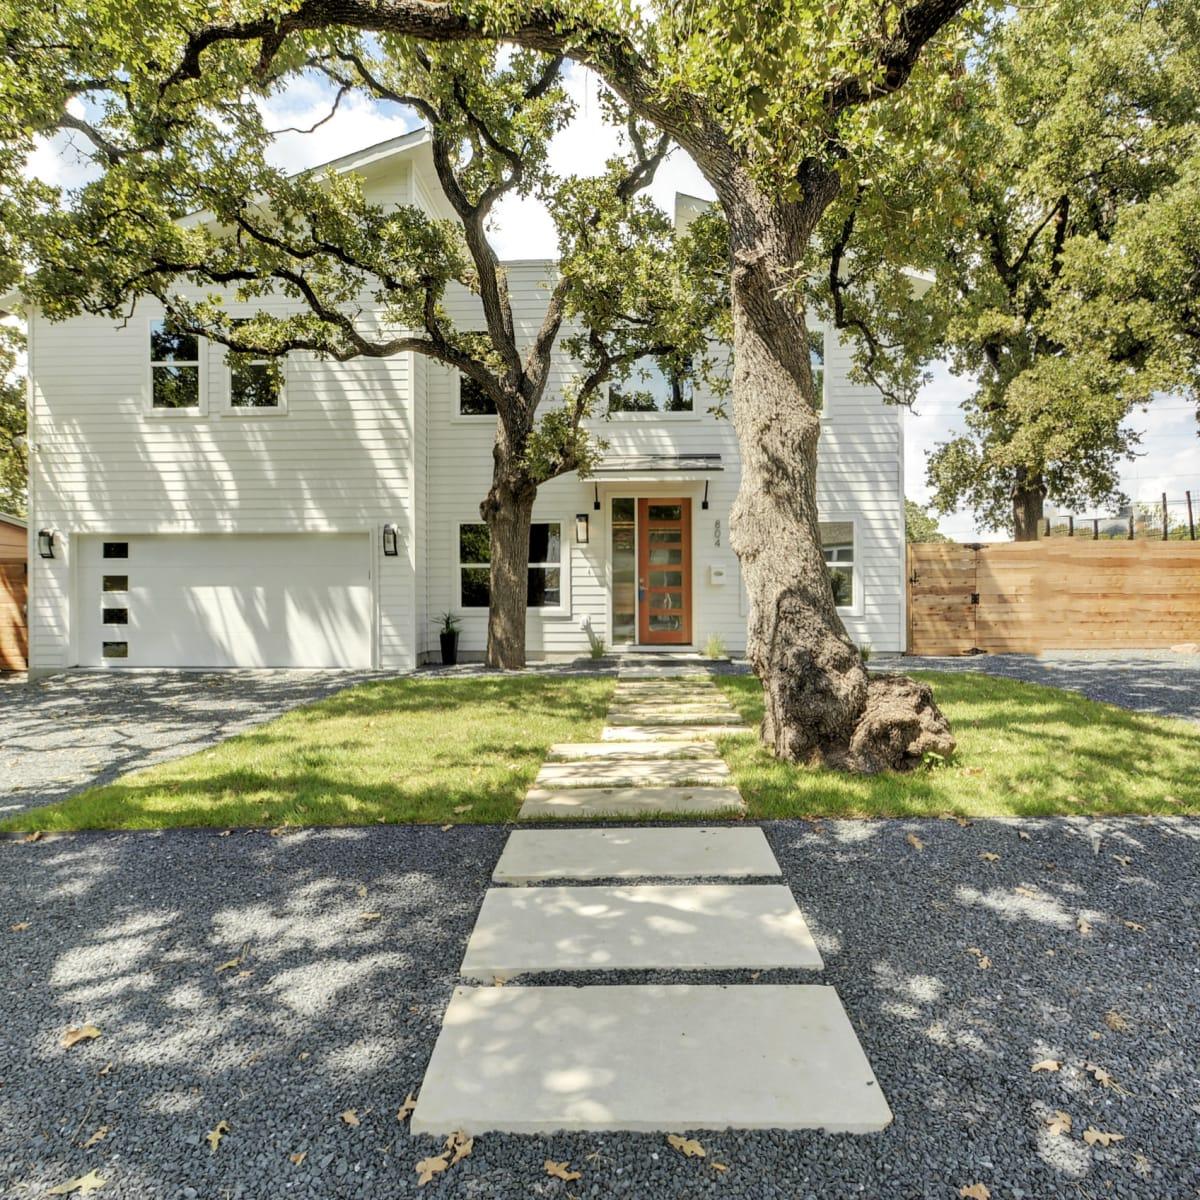 804 Newman Austin house for sale